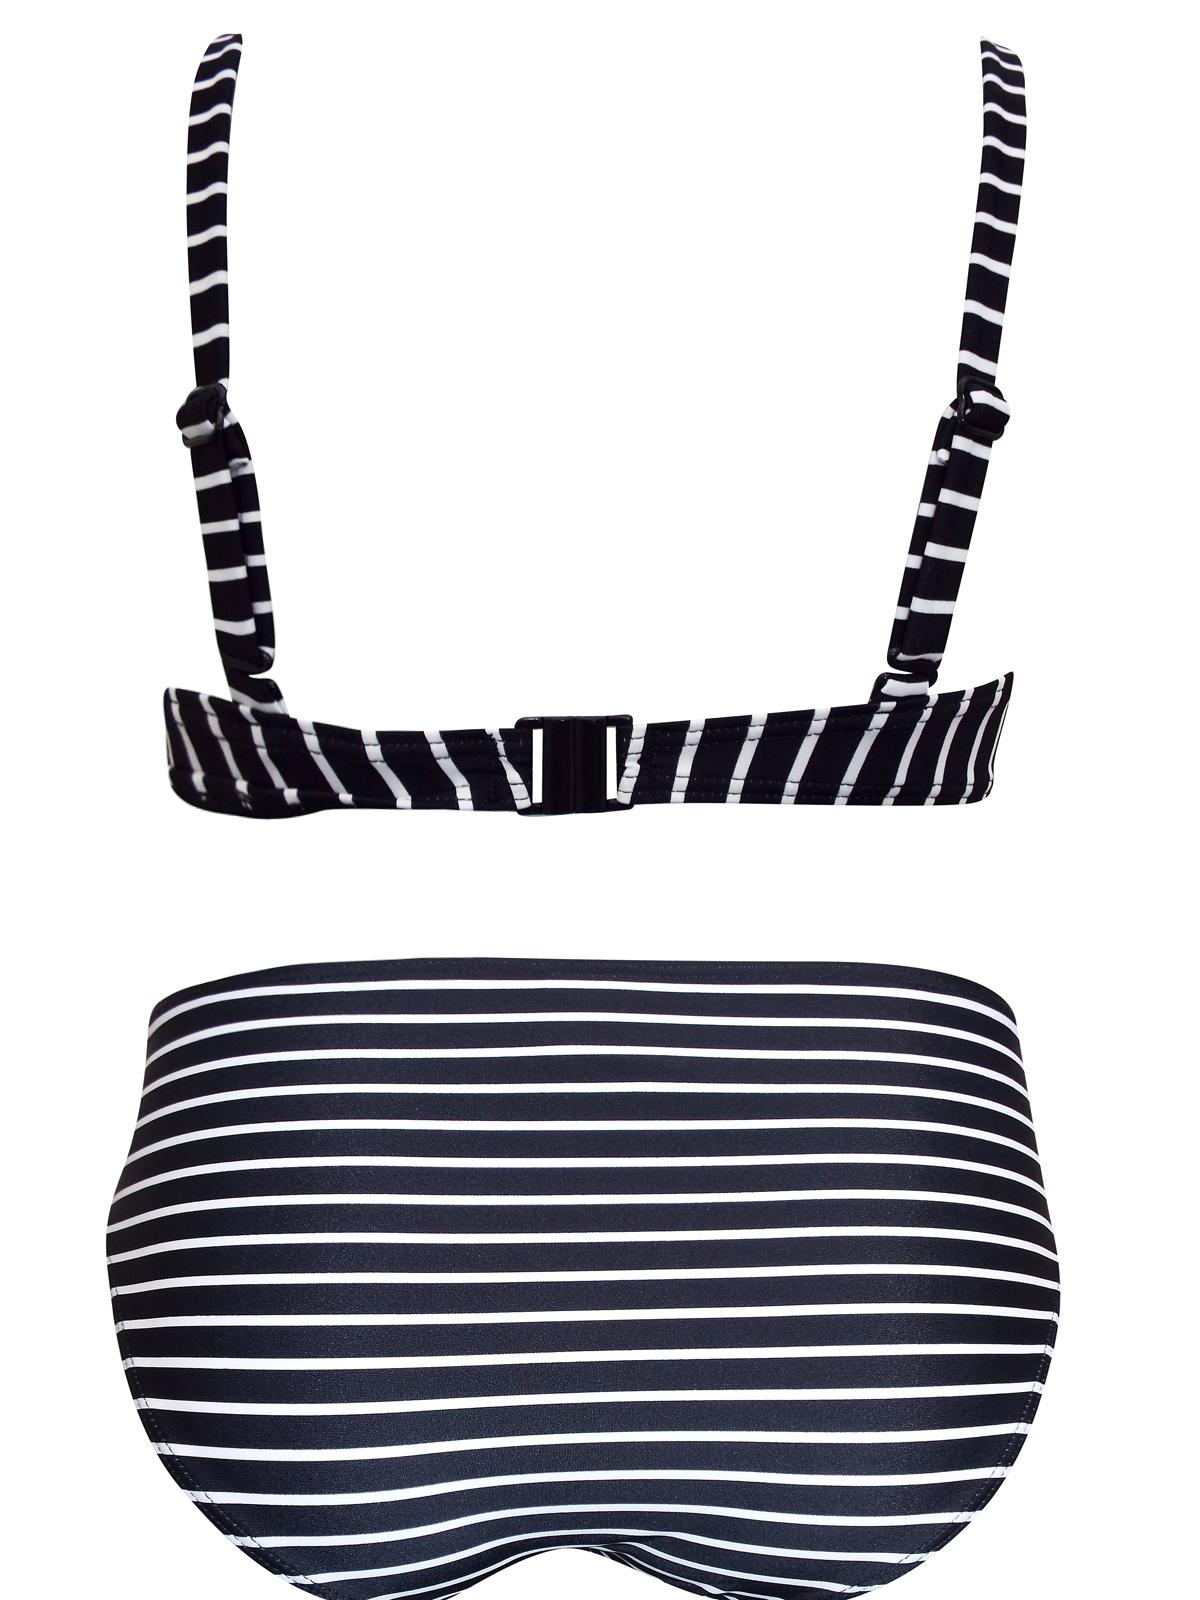 Los Cabos Micro Bandeau Bikini Set | Moda biquíni, Biquini